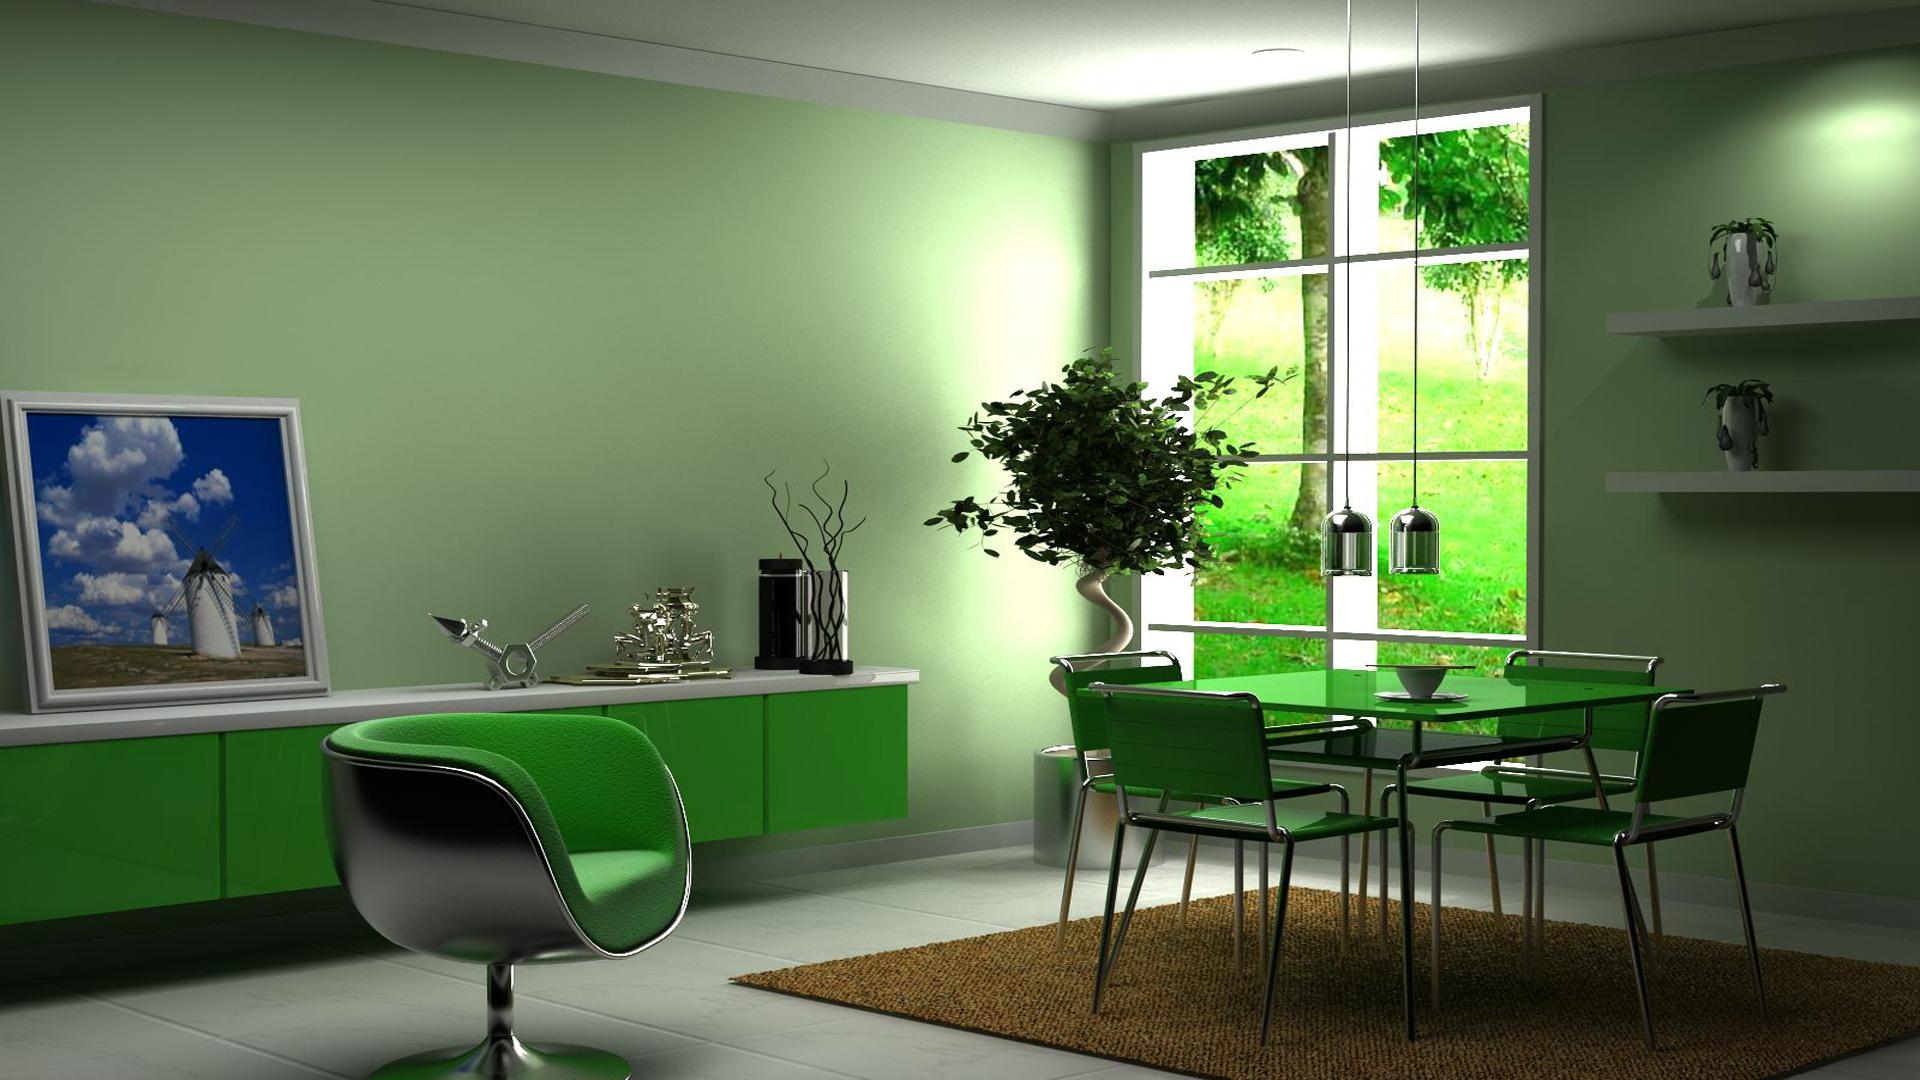 tropical home decor ideas popsugar home.htm 48   graphic wallpaper for home on wallpapersafari  48   graphic wallpaper for home on